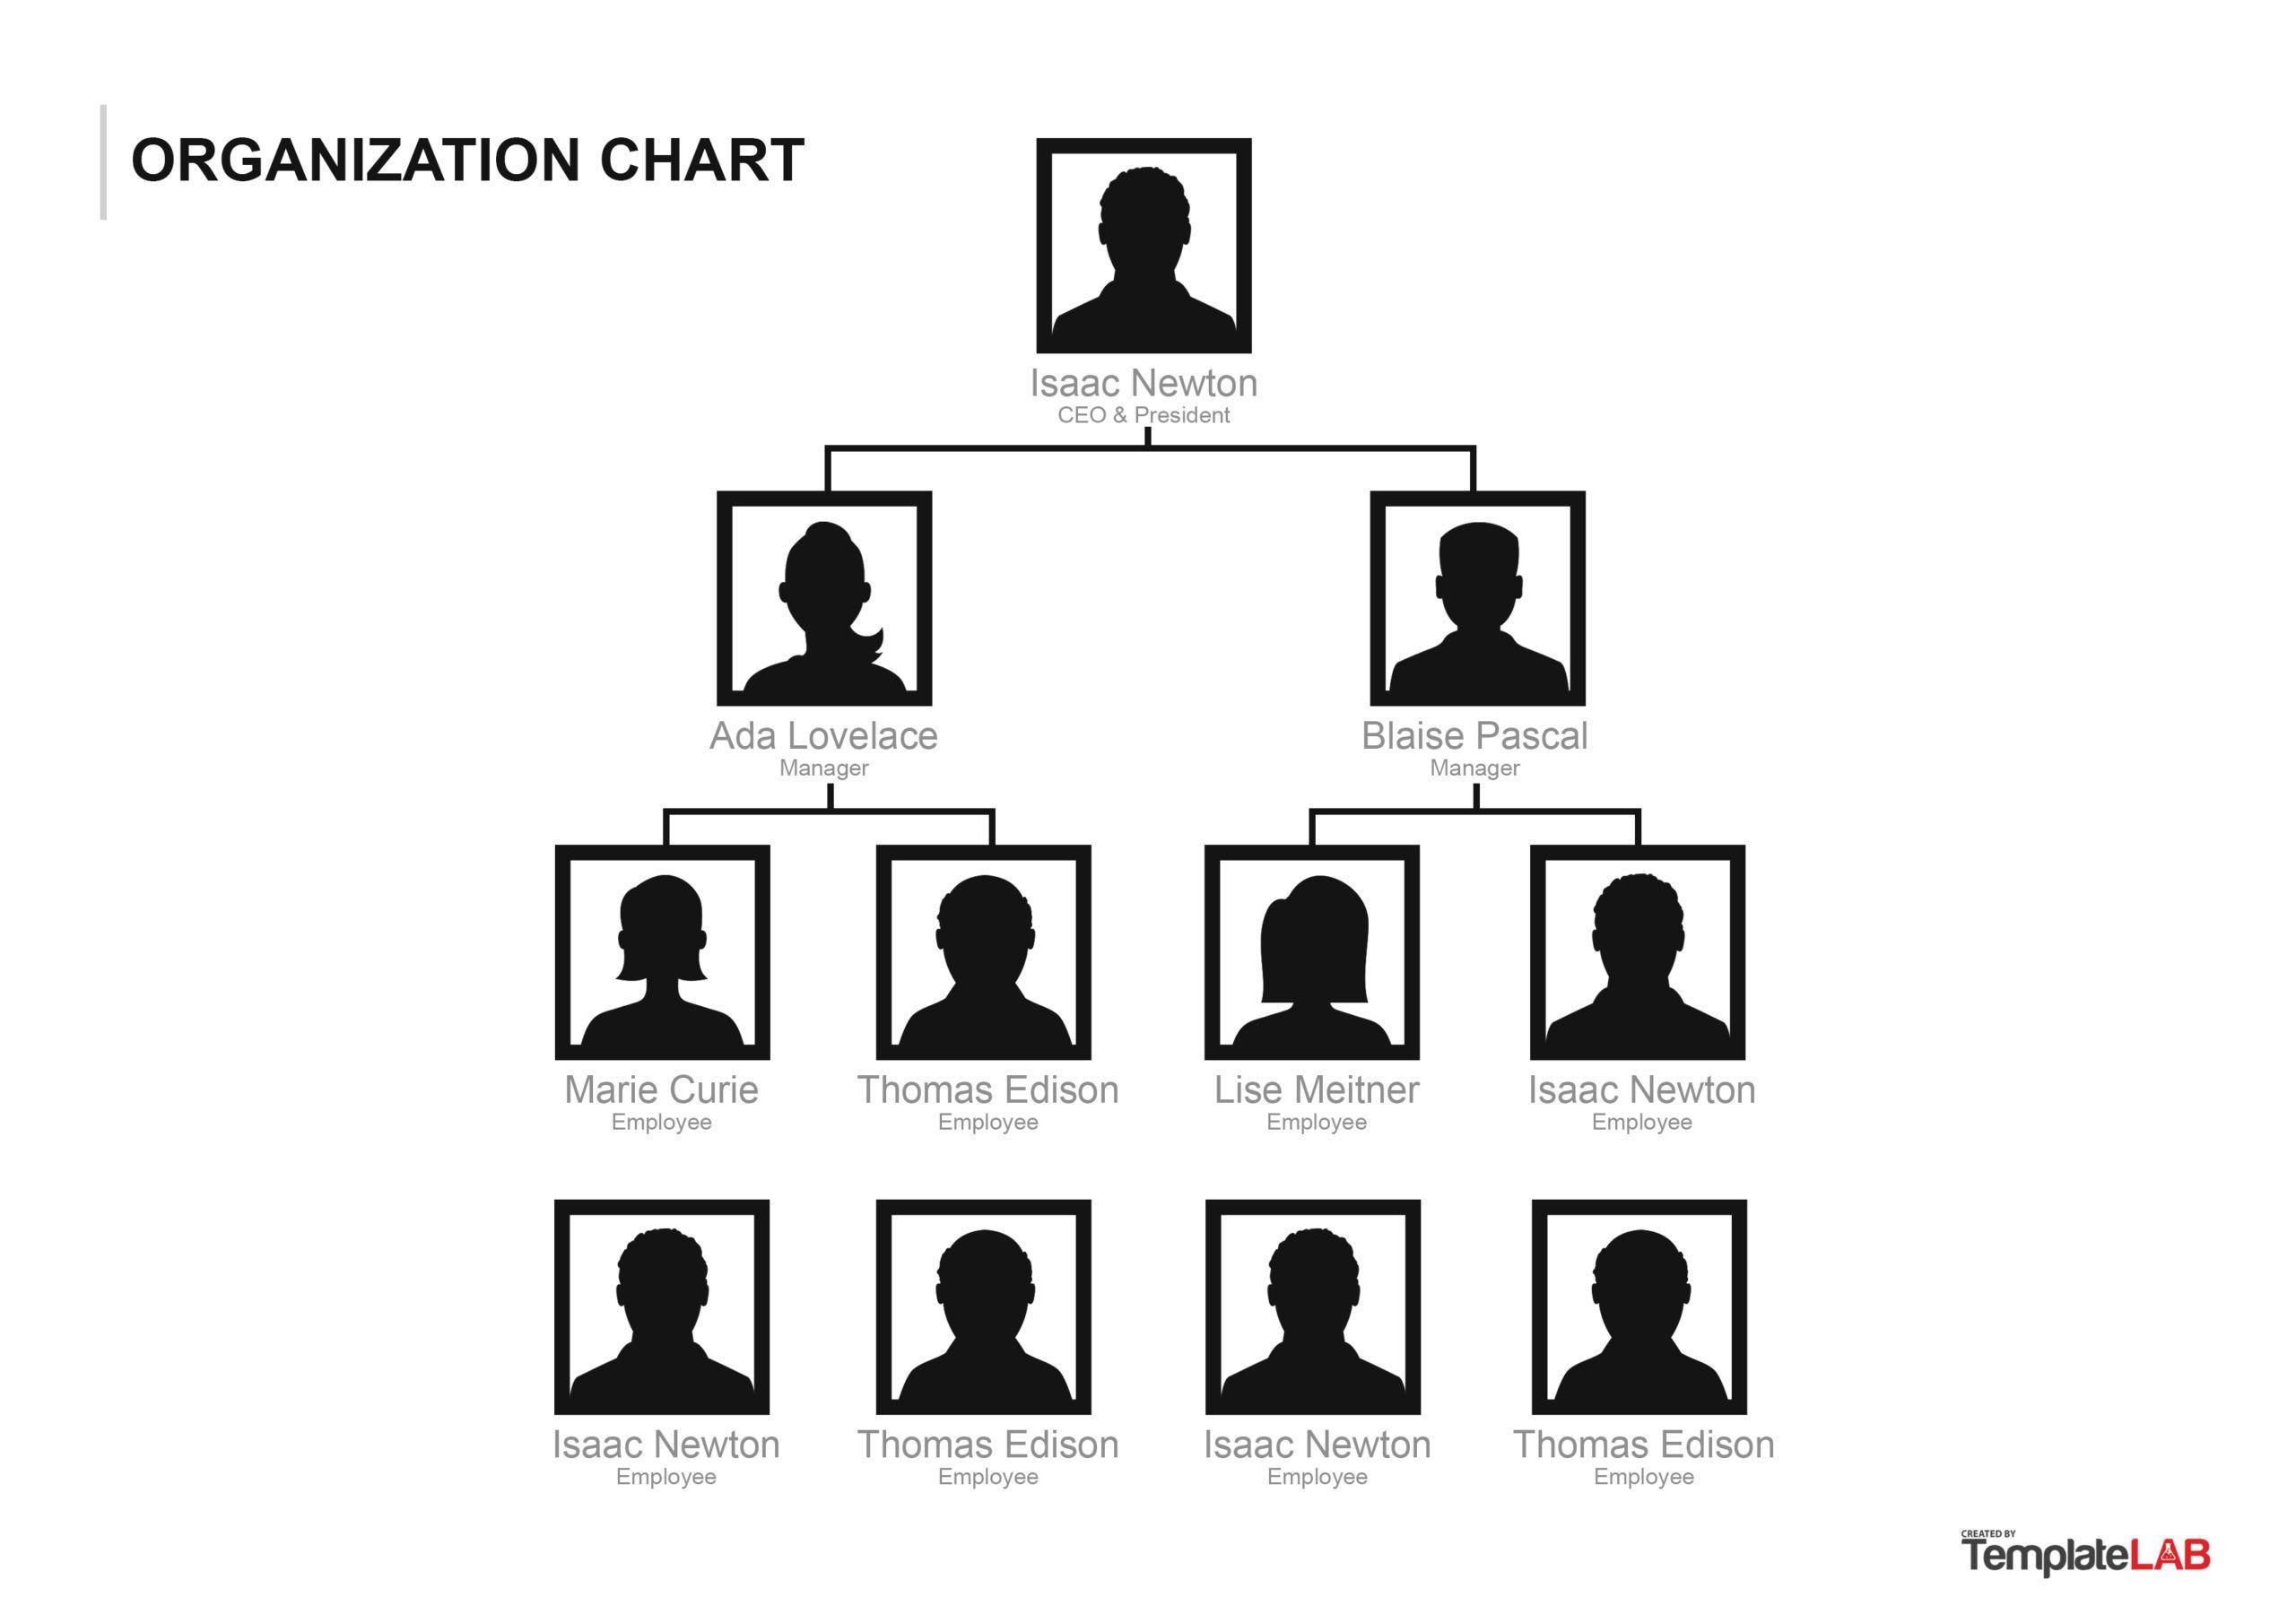 009 Incredible Microsoft Word Organization Chart Template Design  Organizational Download 2007Full